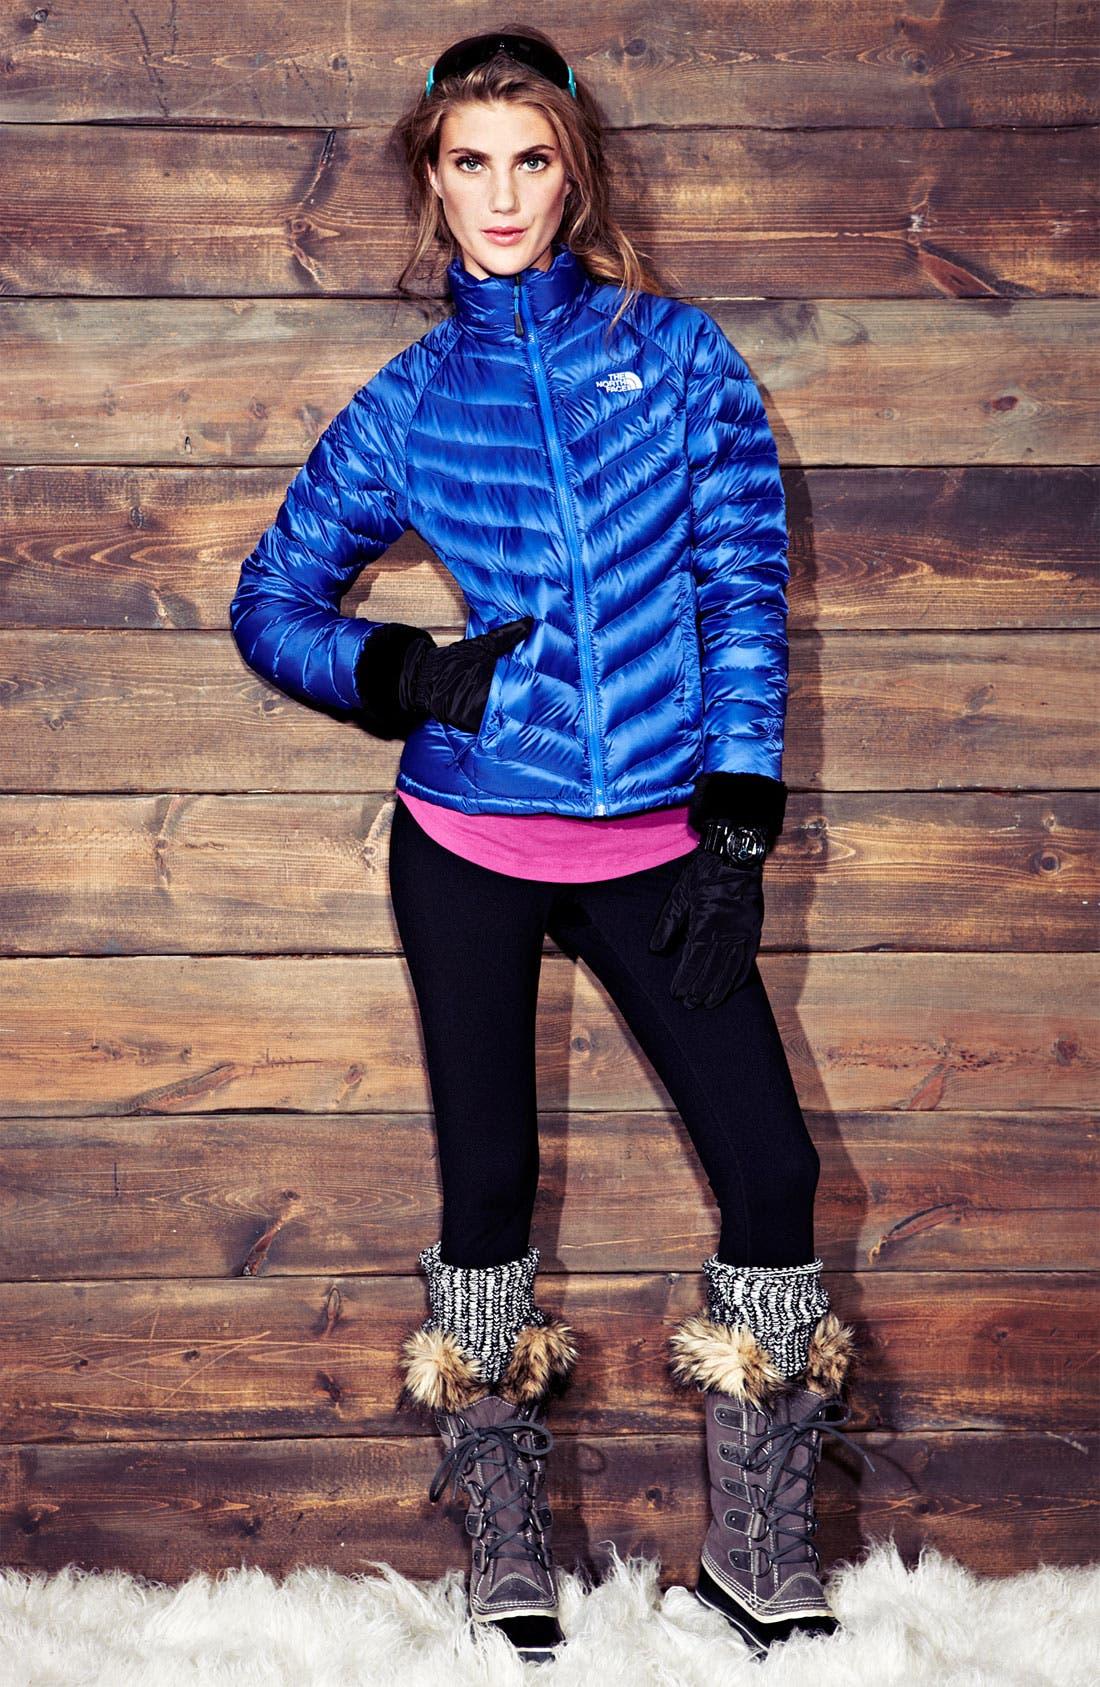 Alternate Image 1 Selected - The North Face Jacket & Zella Leggings